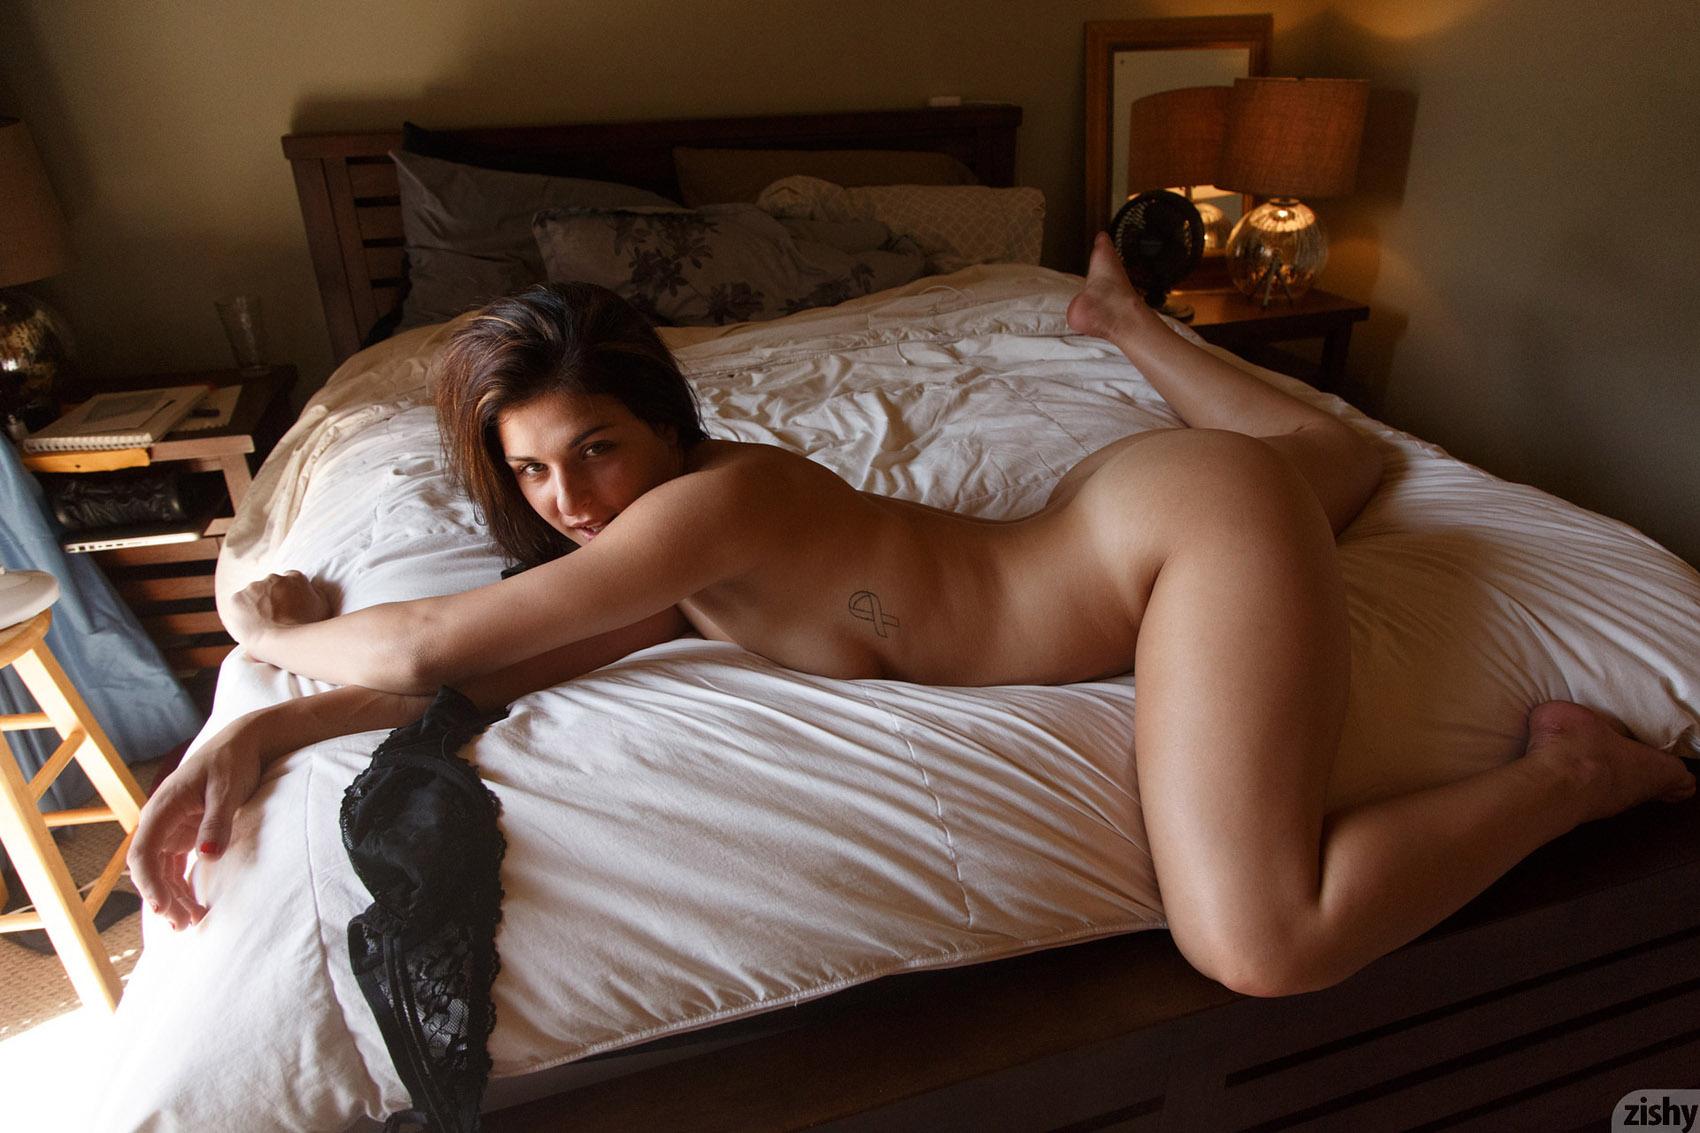 Bedroom girl nude homemade